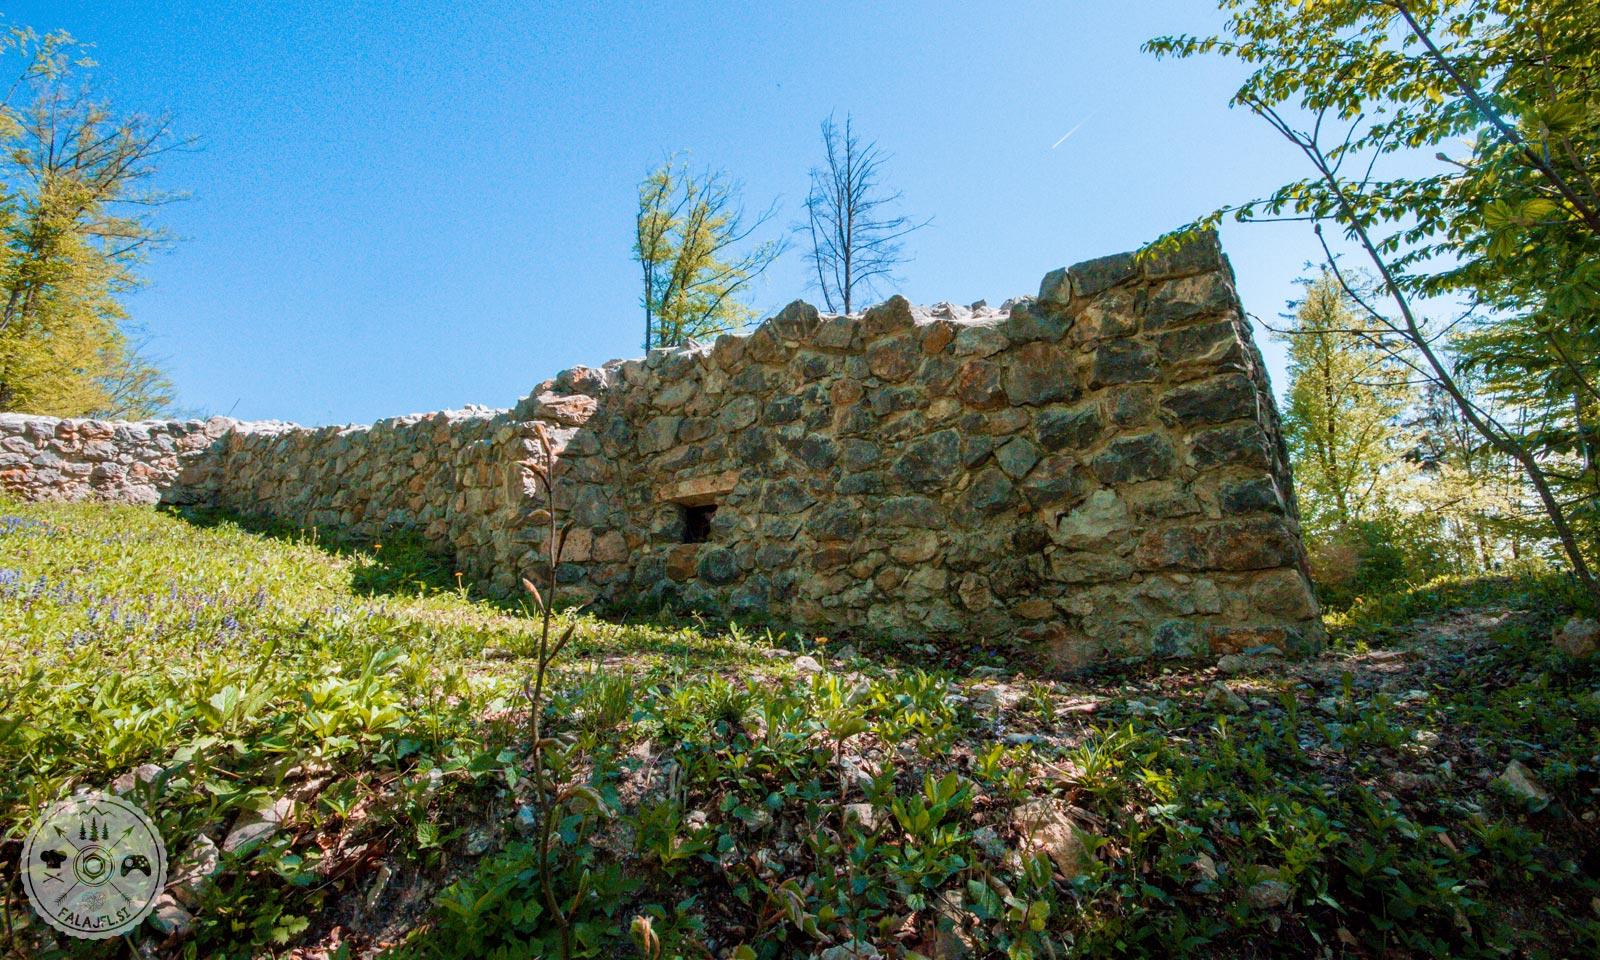 Stari grad, Arboretum, Volčji Potok